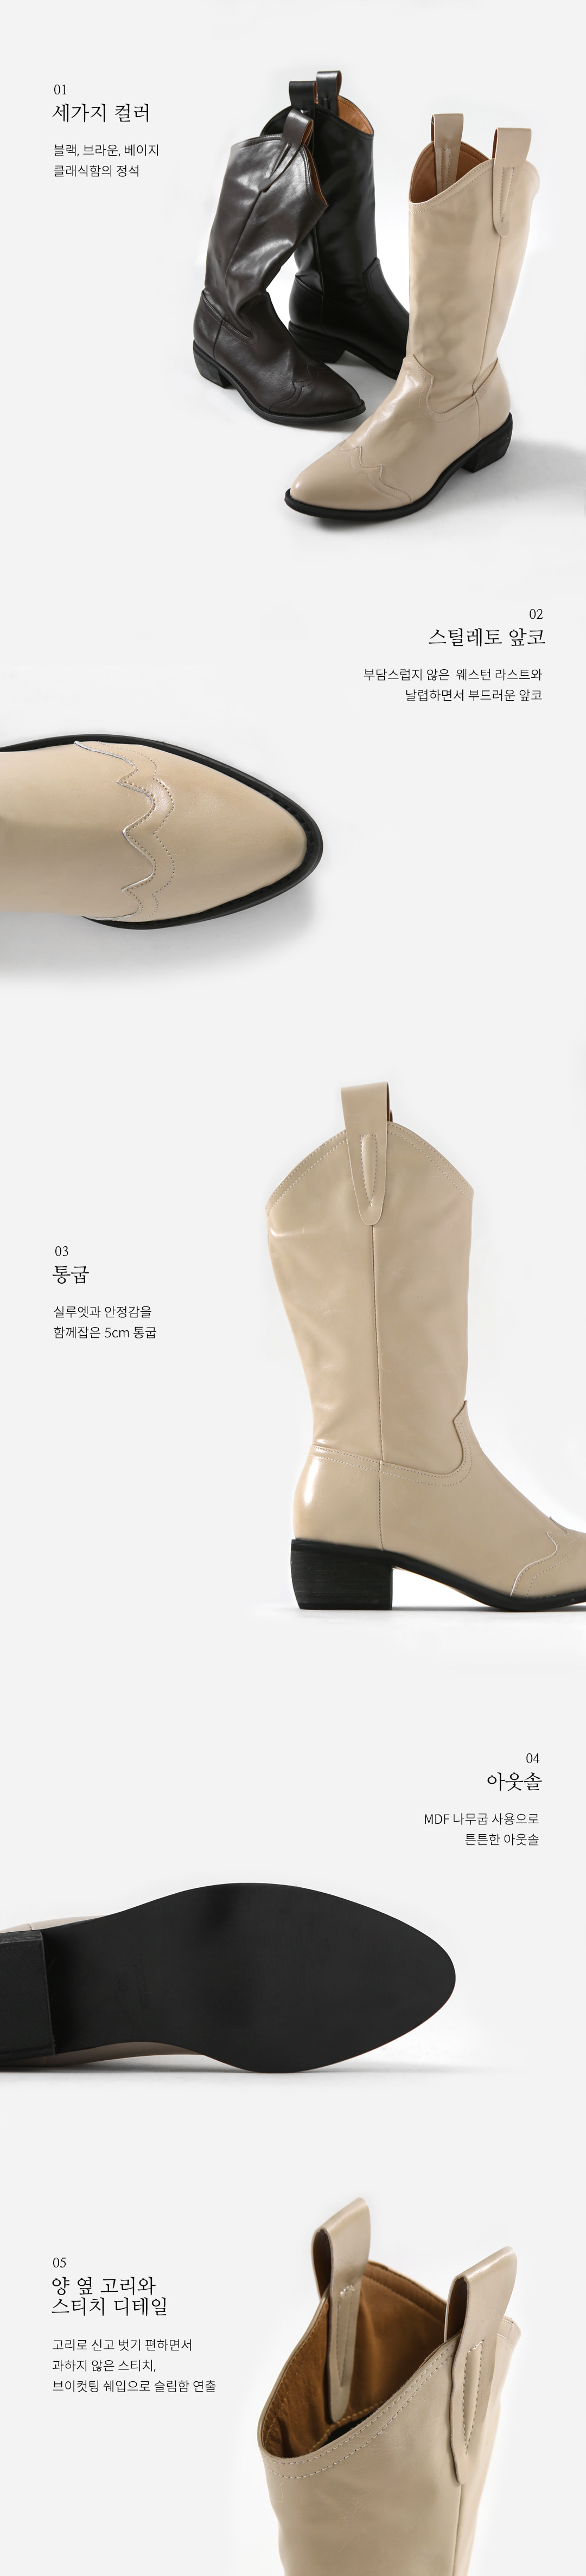 Area Western Middle Boots BLLTT4c189